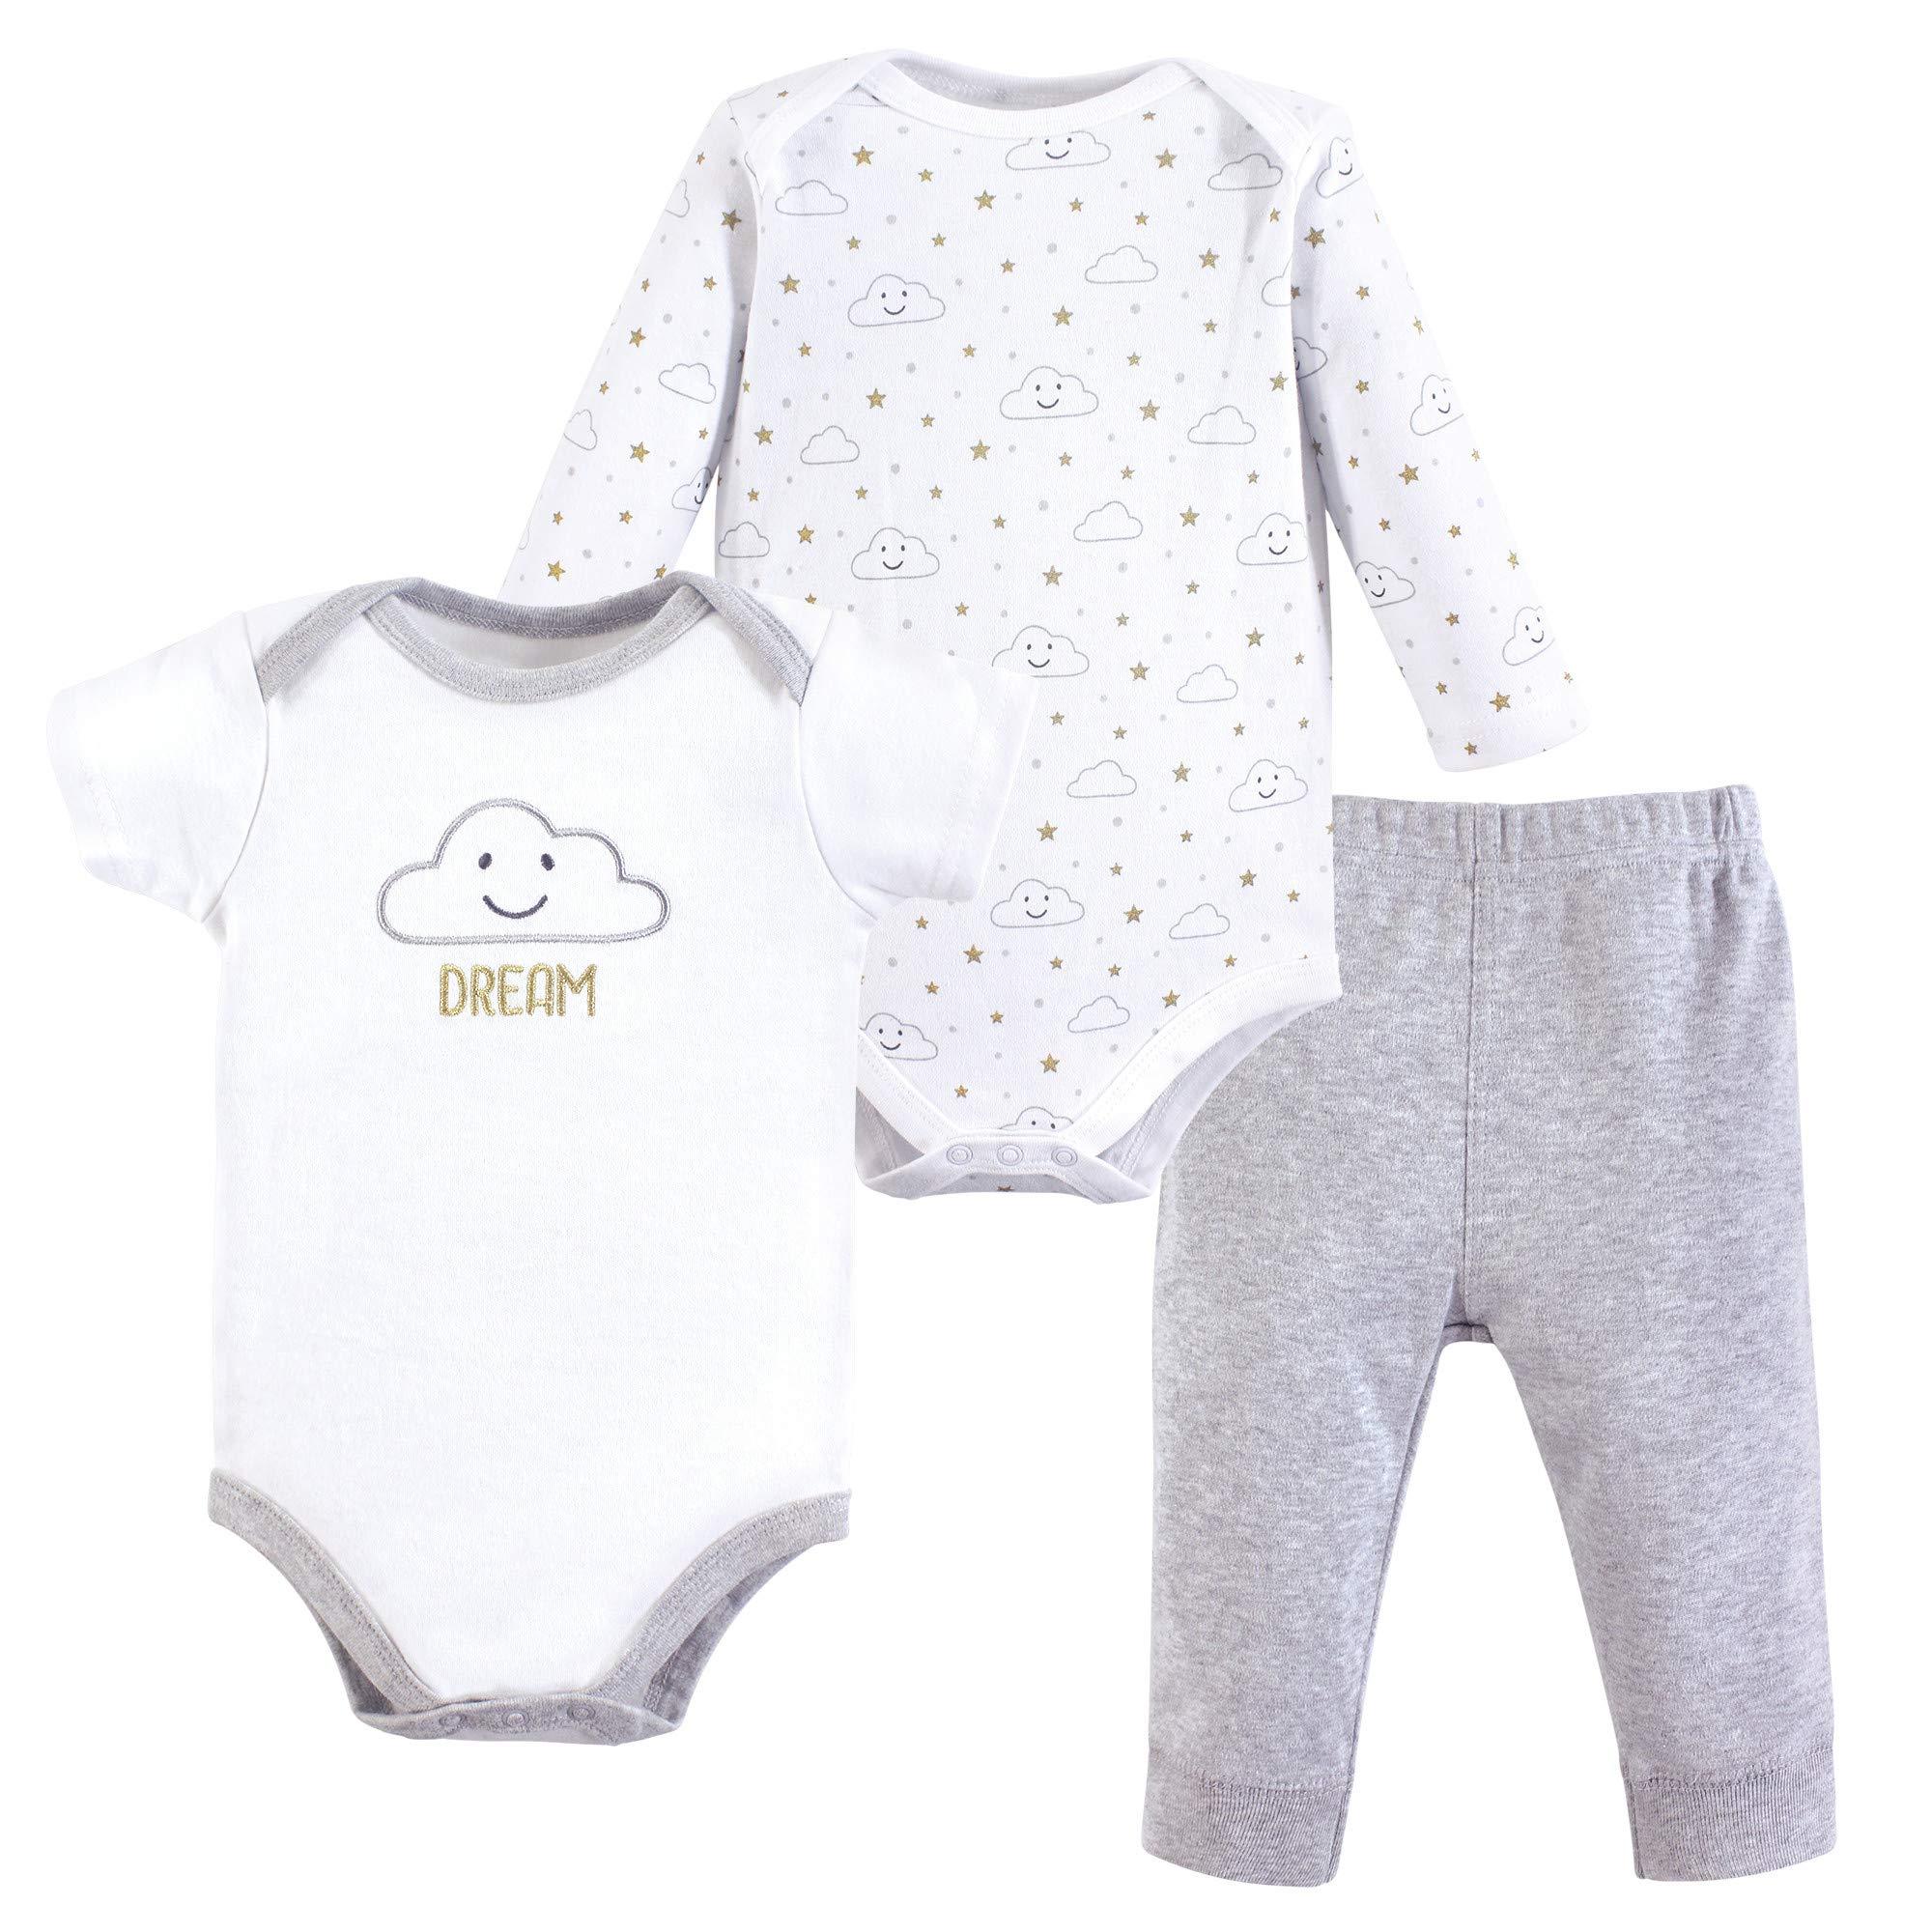 Hudson Baby Baby Girls' Bodysuit and Pant Set